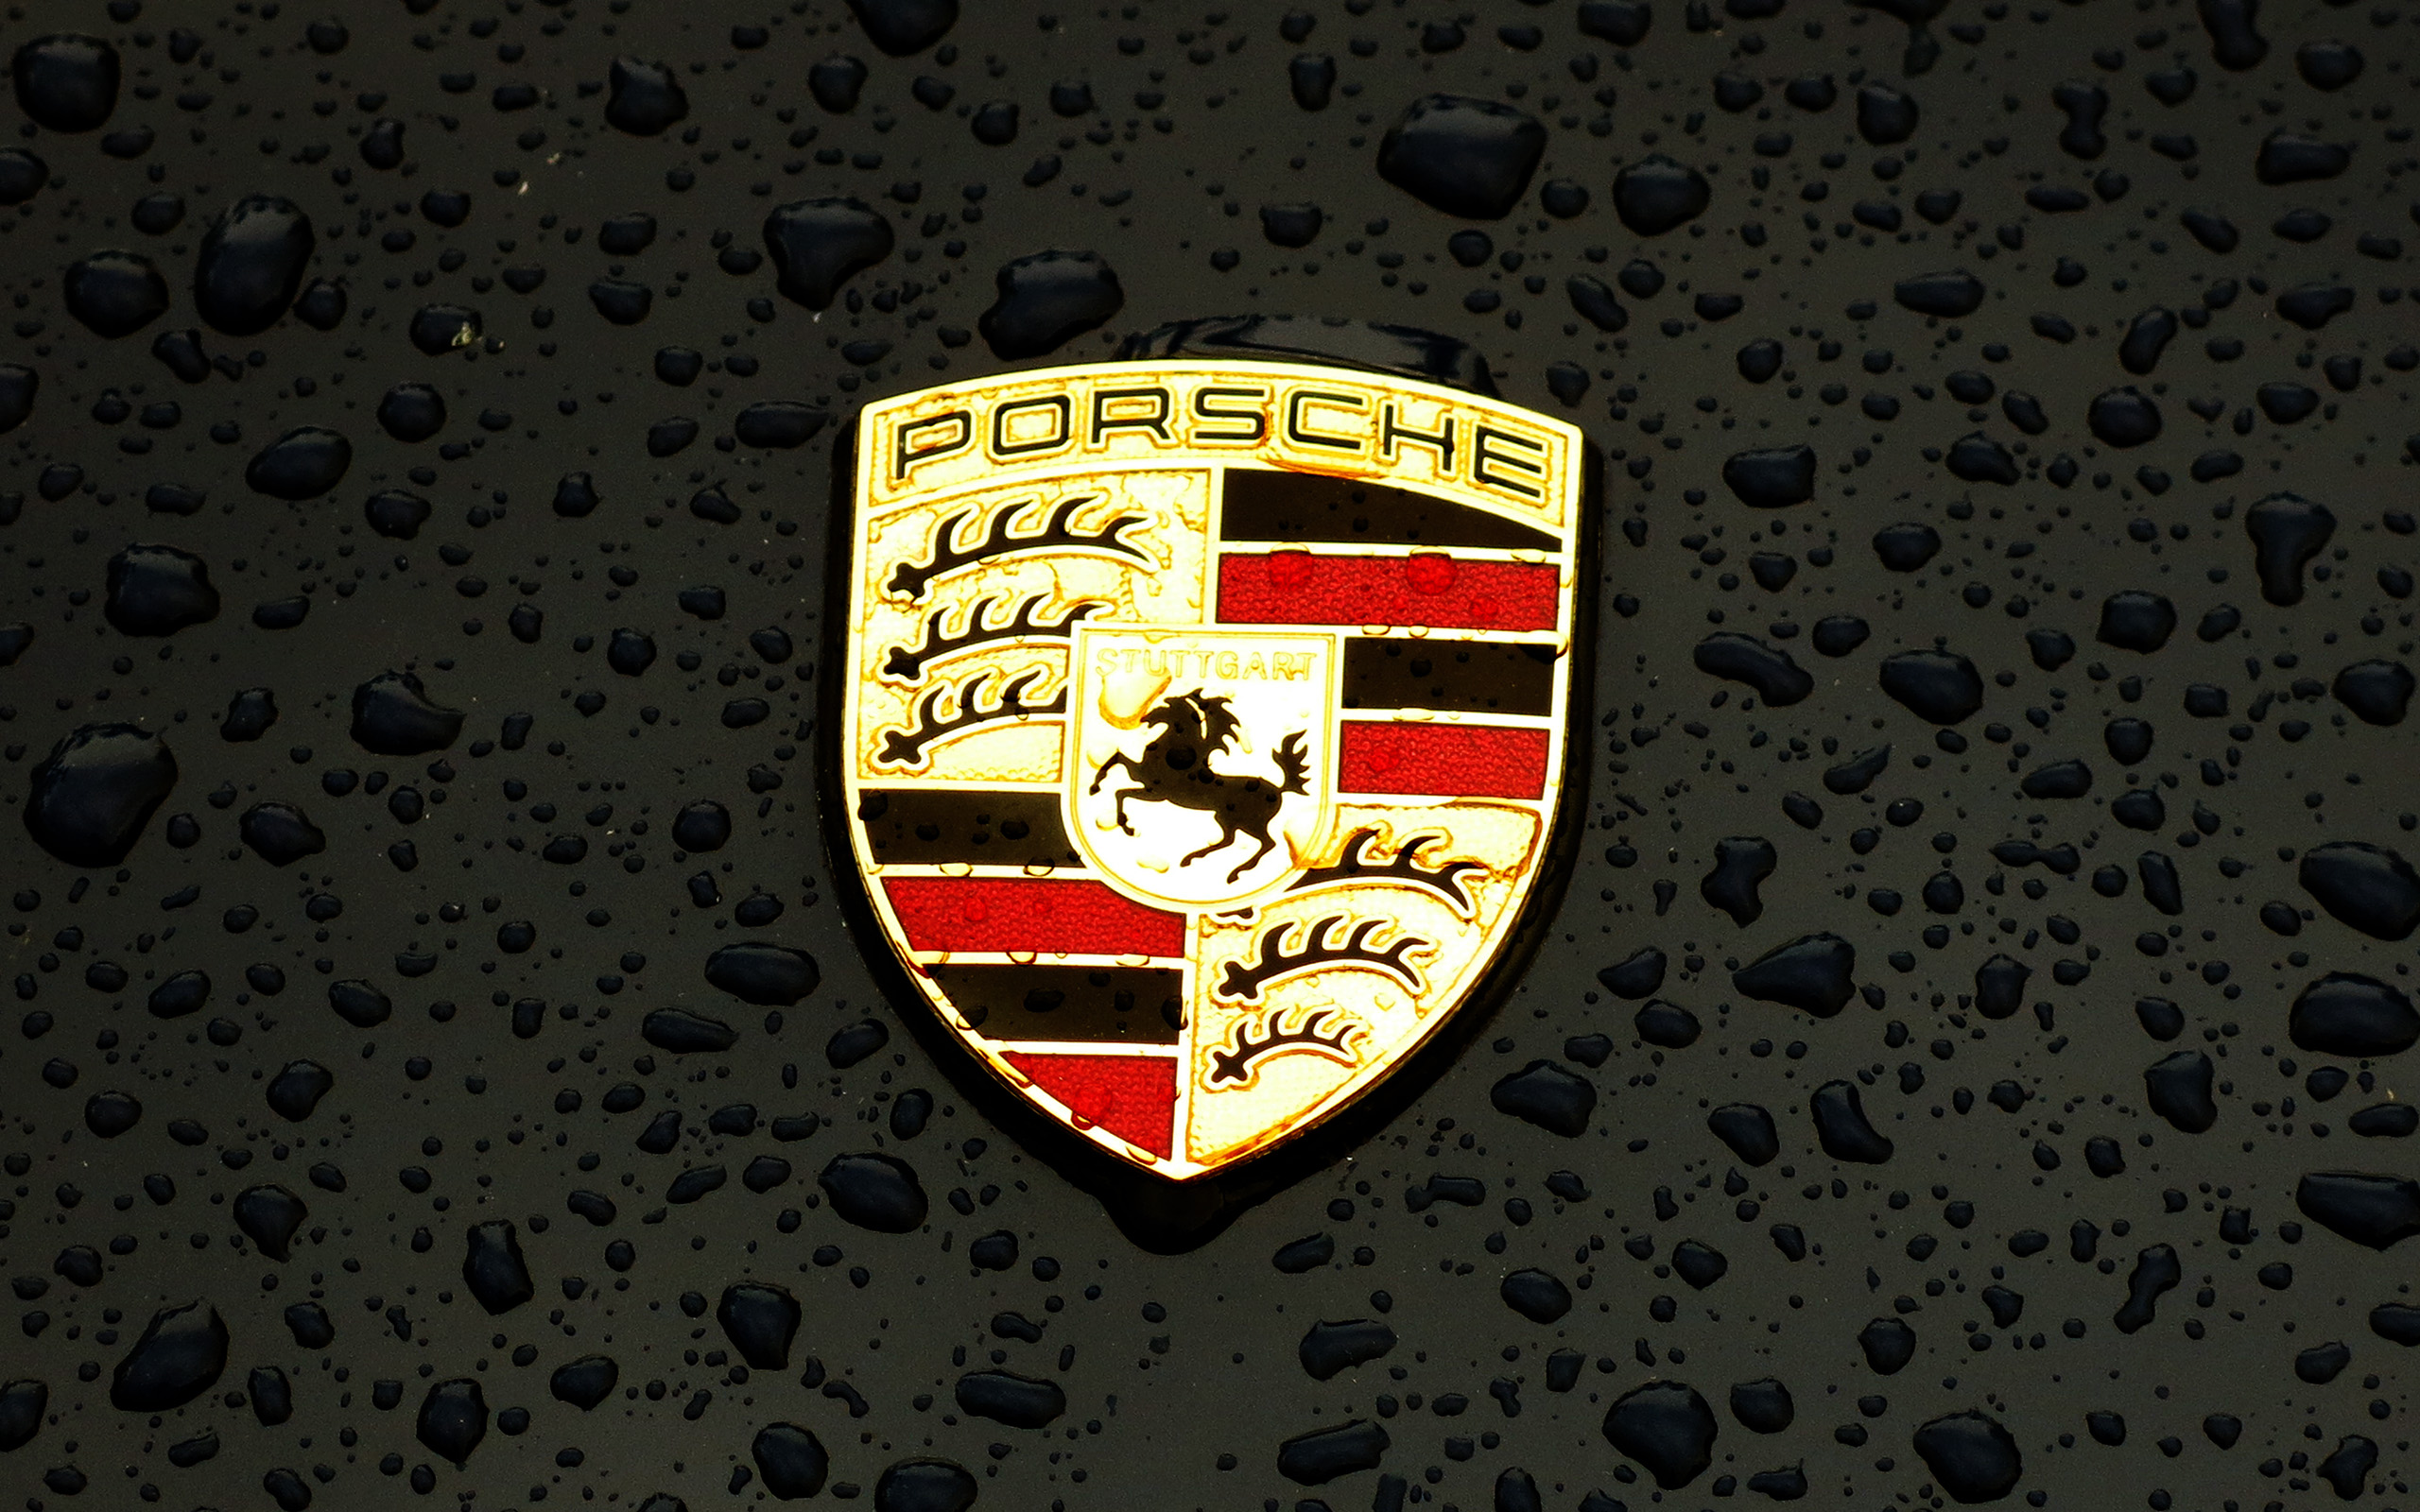 ax15-porsche-logo-emblem-car-illustration-art-dark-wallpaper